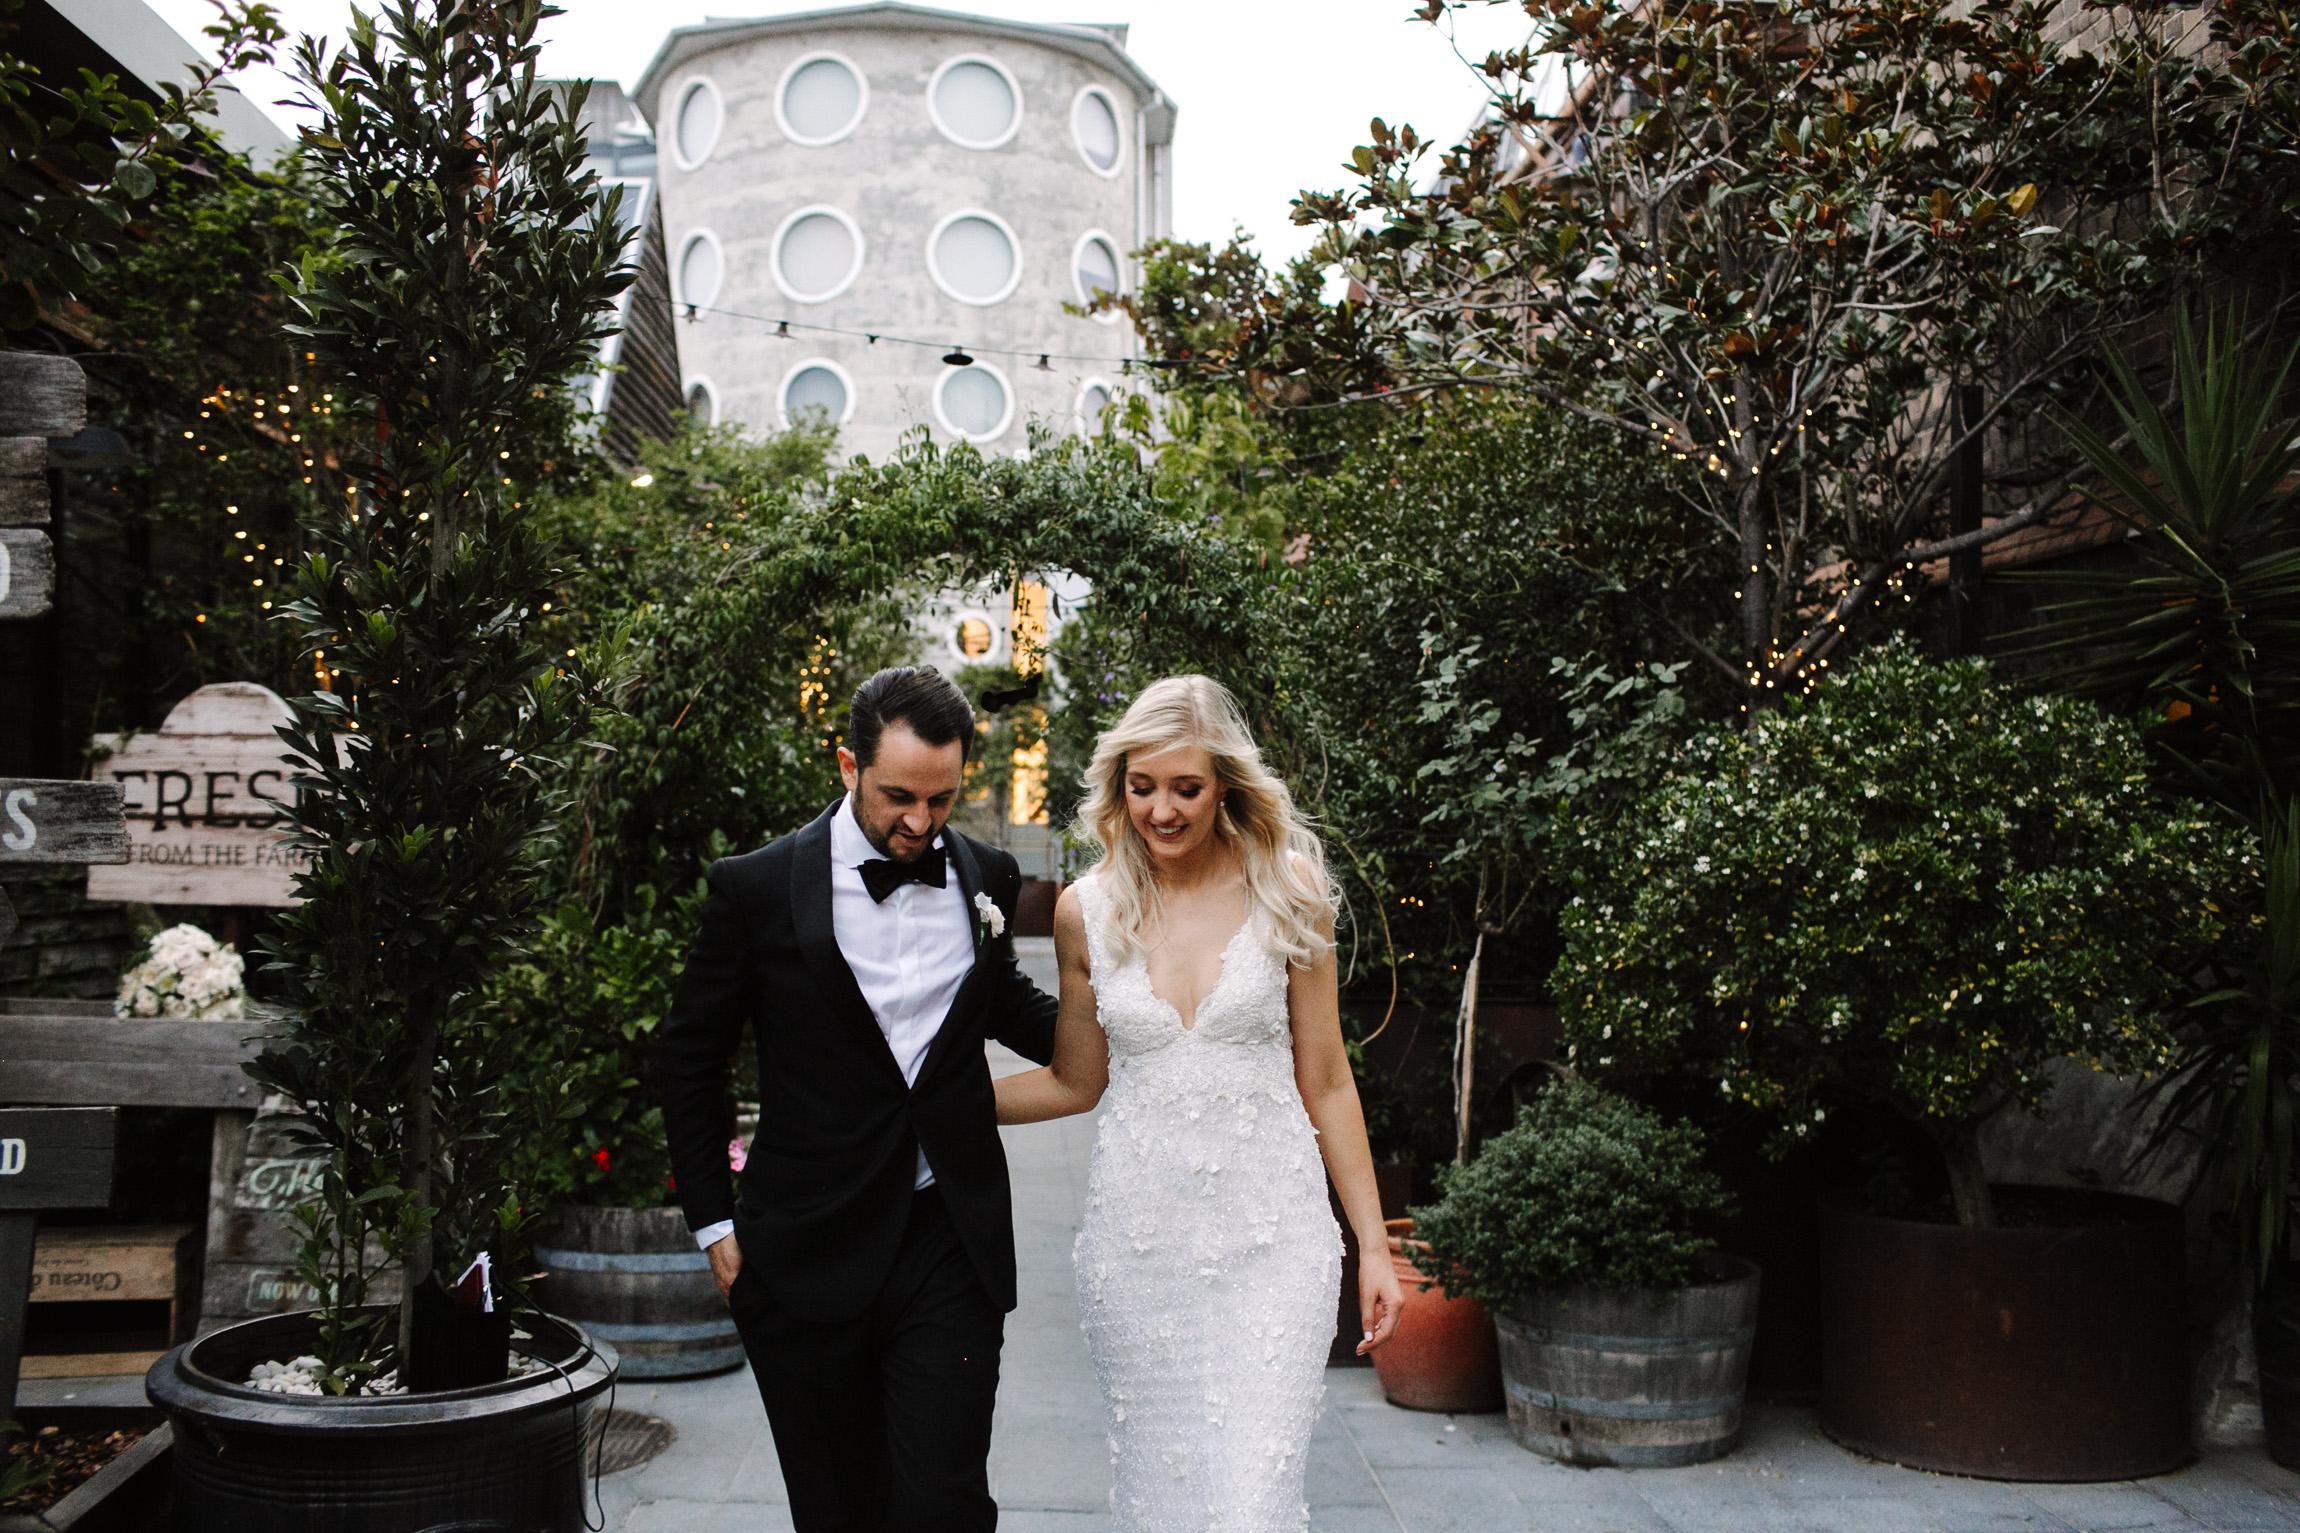 180223_justinaaron_wedding_charlotte_david_h-236.jpg